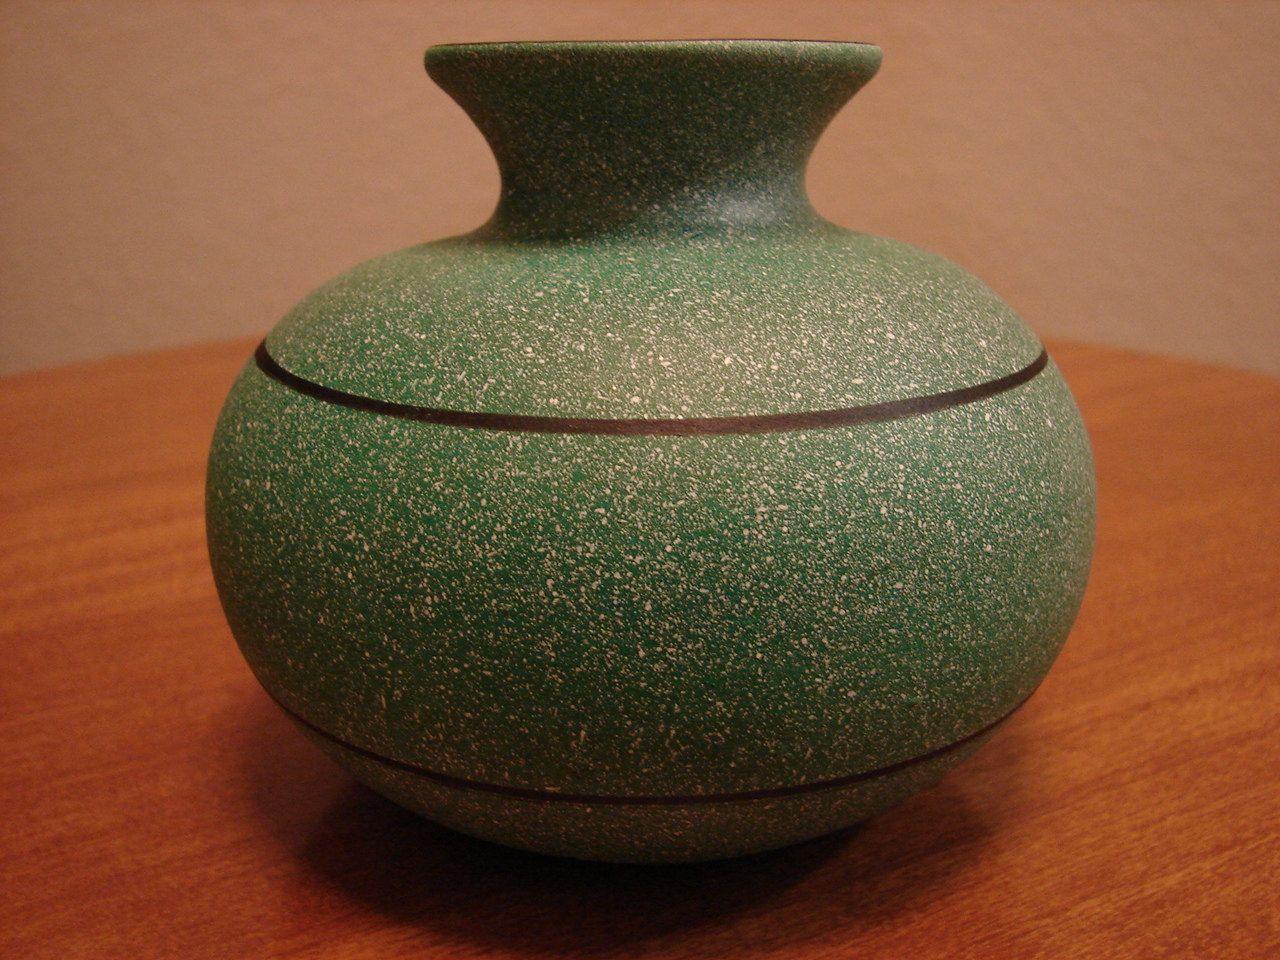 Vintage green orb vase art deco style round vase green vase vintage green orb vase art deco style round vase green vase sandstone reviewsmspy